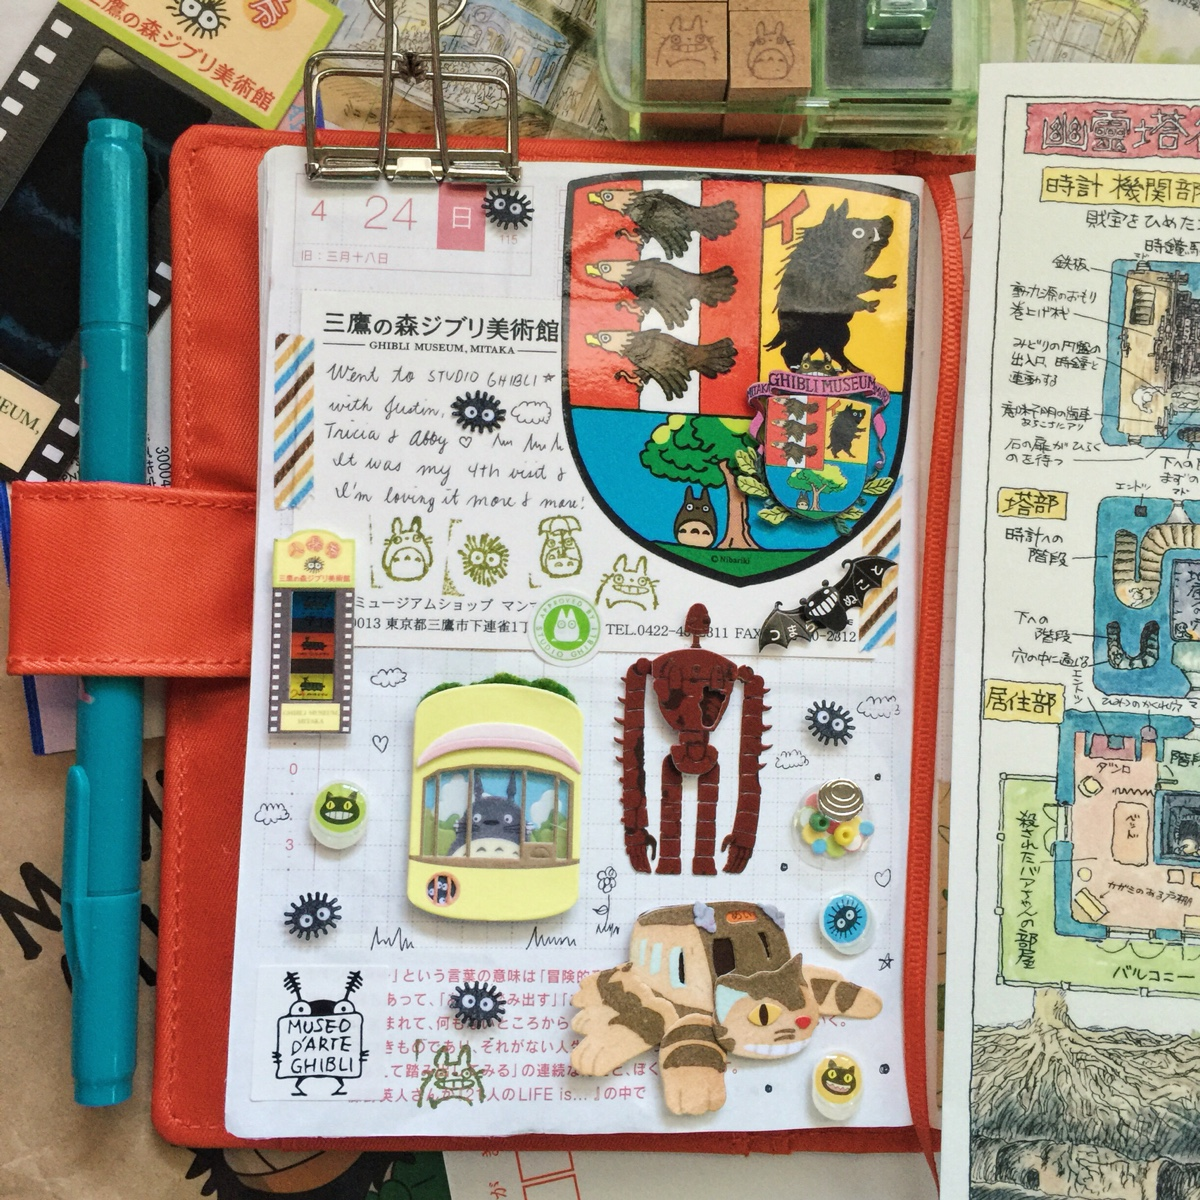 ghibli-spread-hobonichi-journaling.jpg